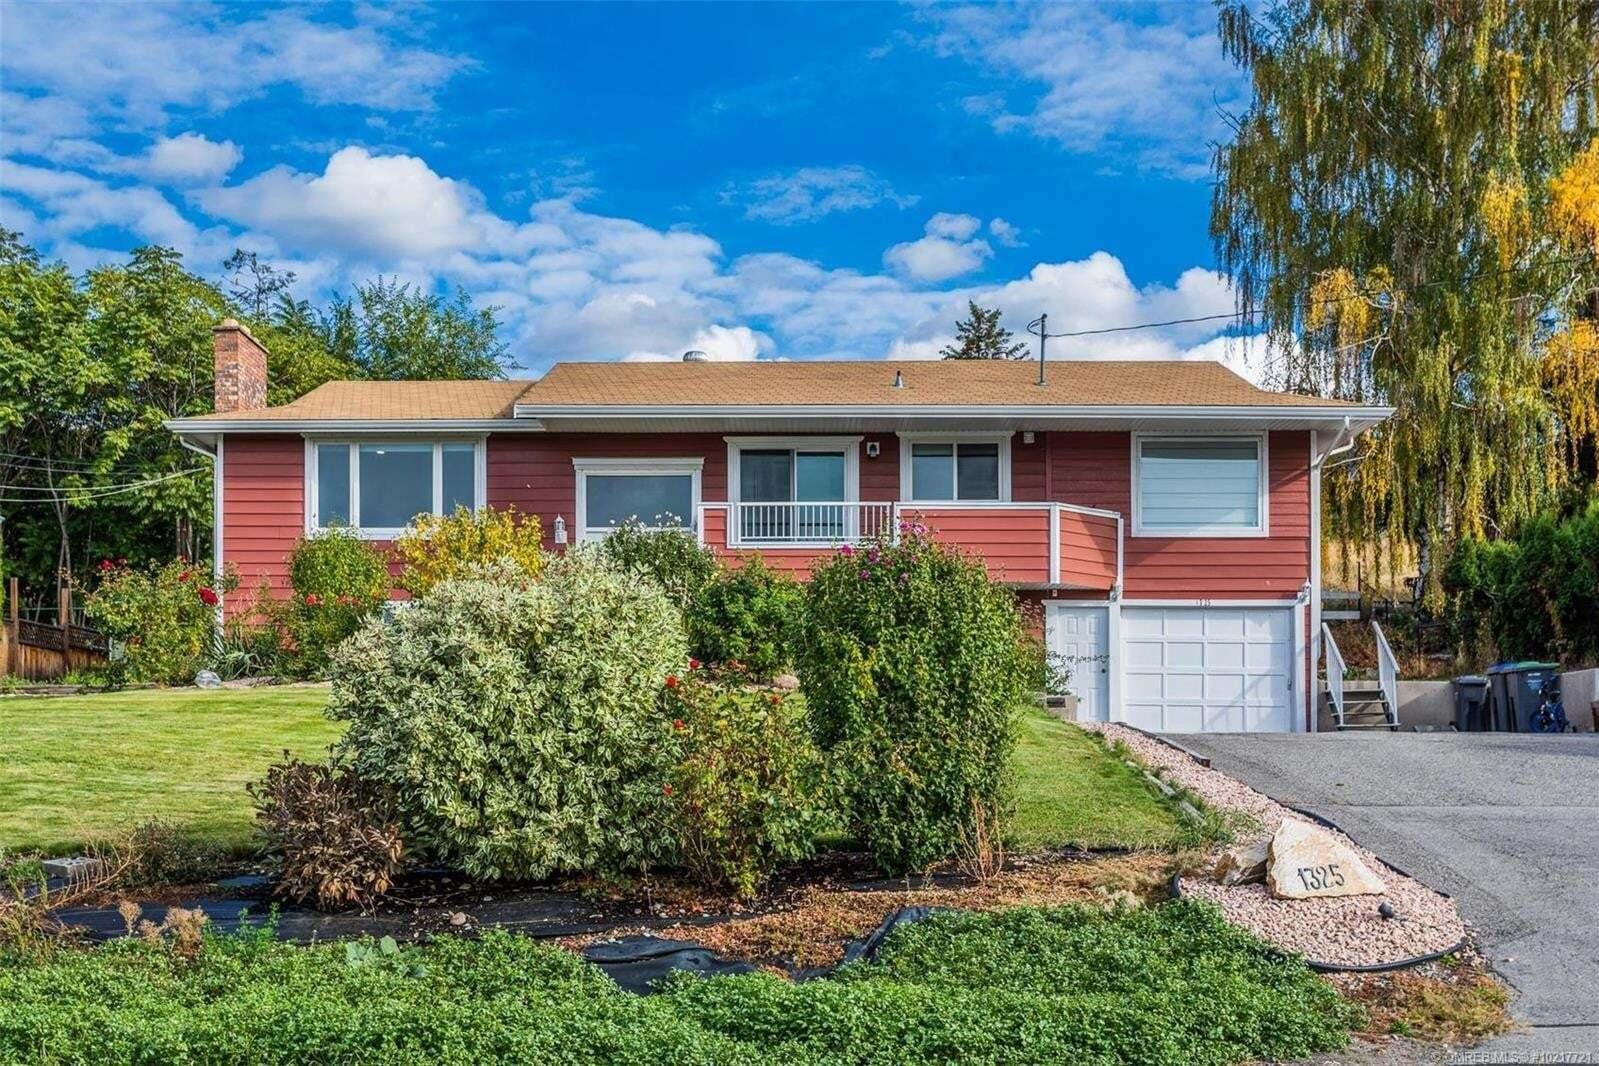 House for sale at 1325 Morrison Rd Kelowna British Columbia - MLS: 10217721